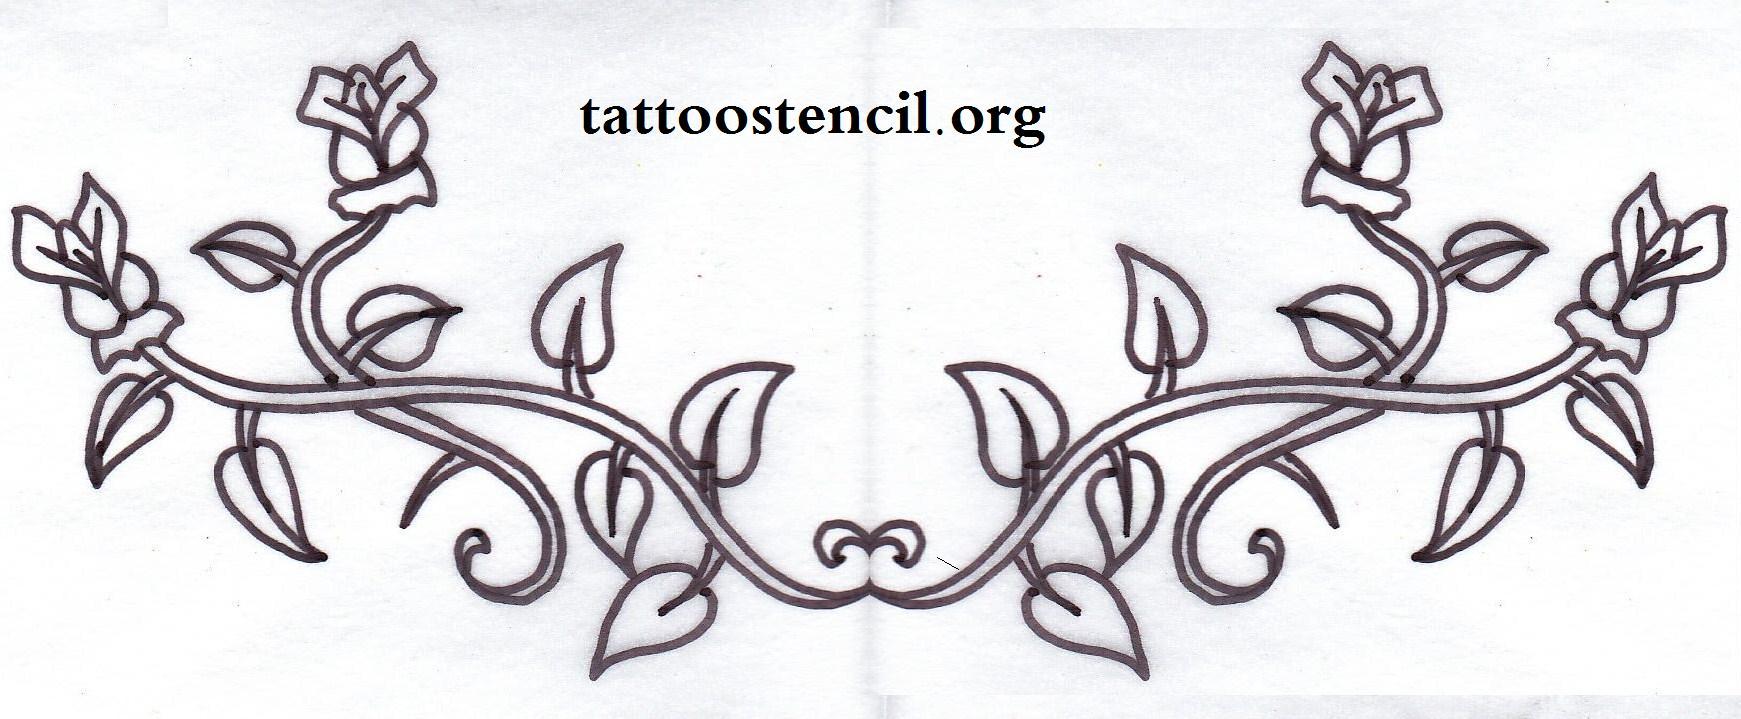 Rose Vine Tattoo Stencil Designs